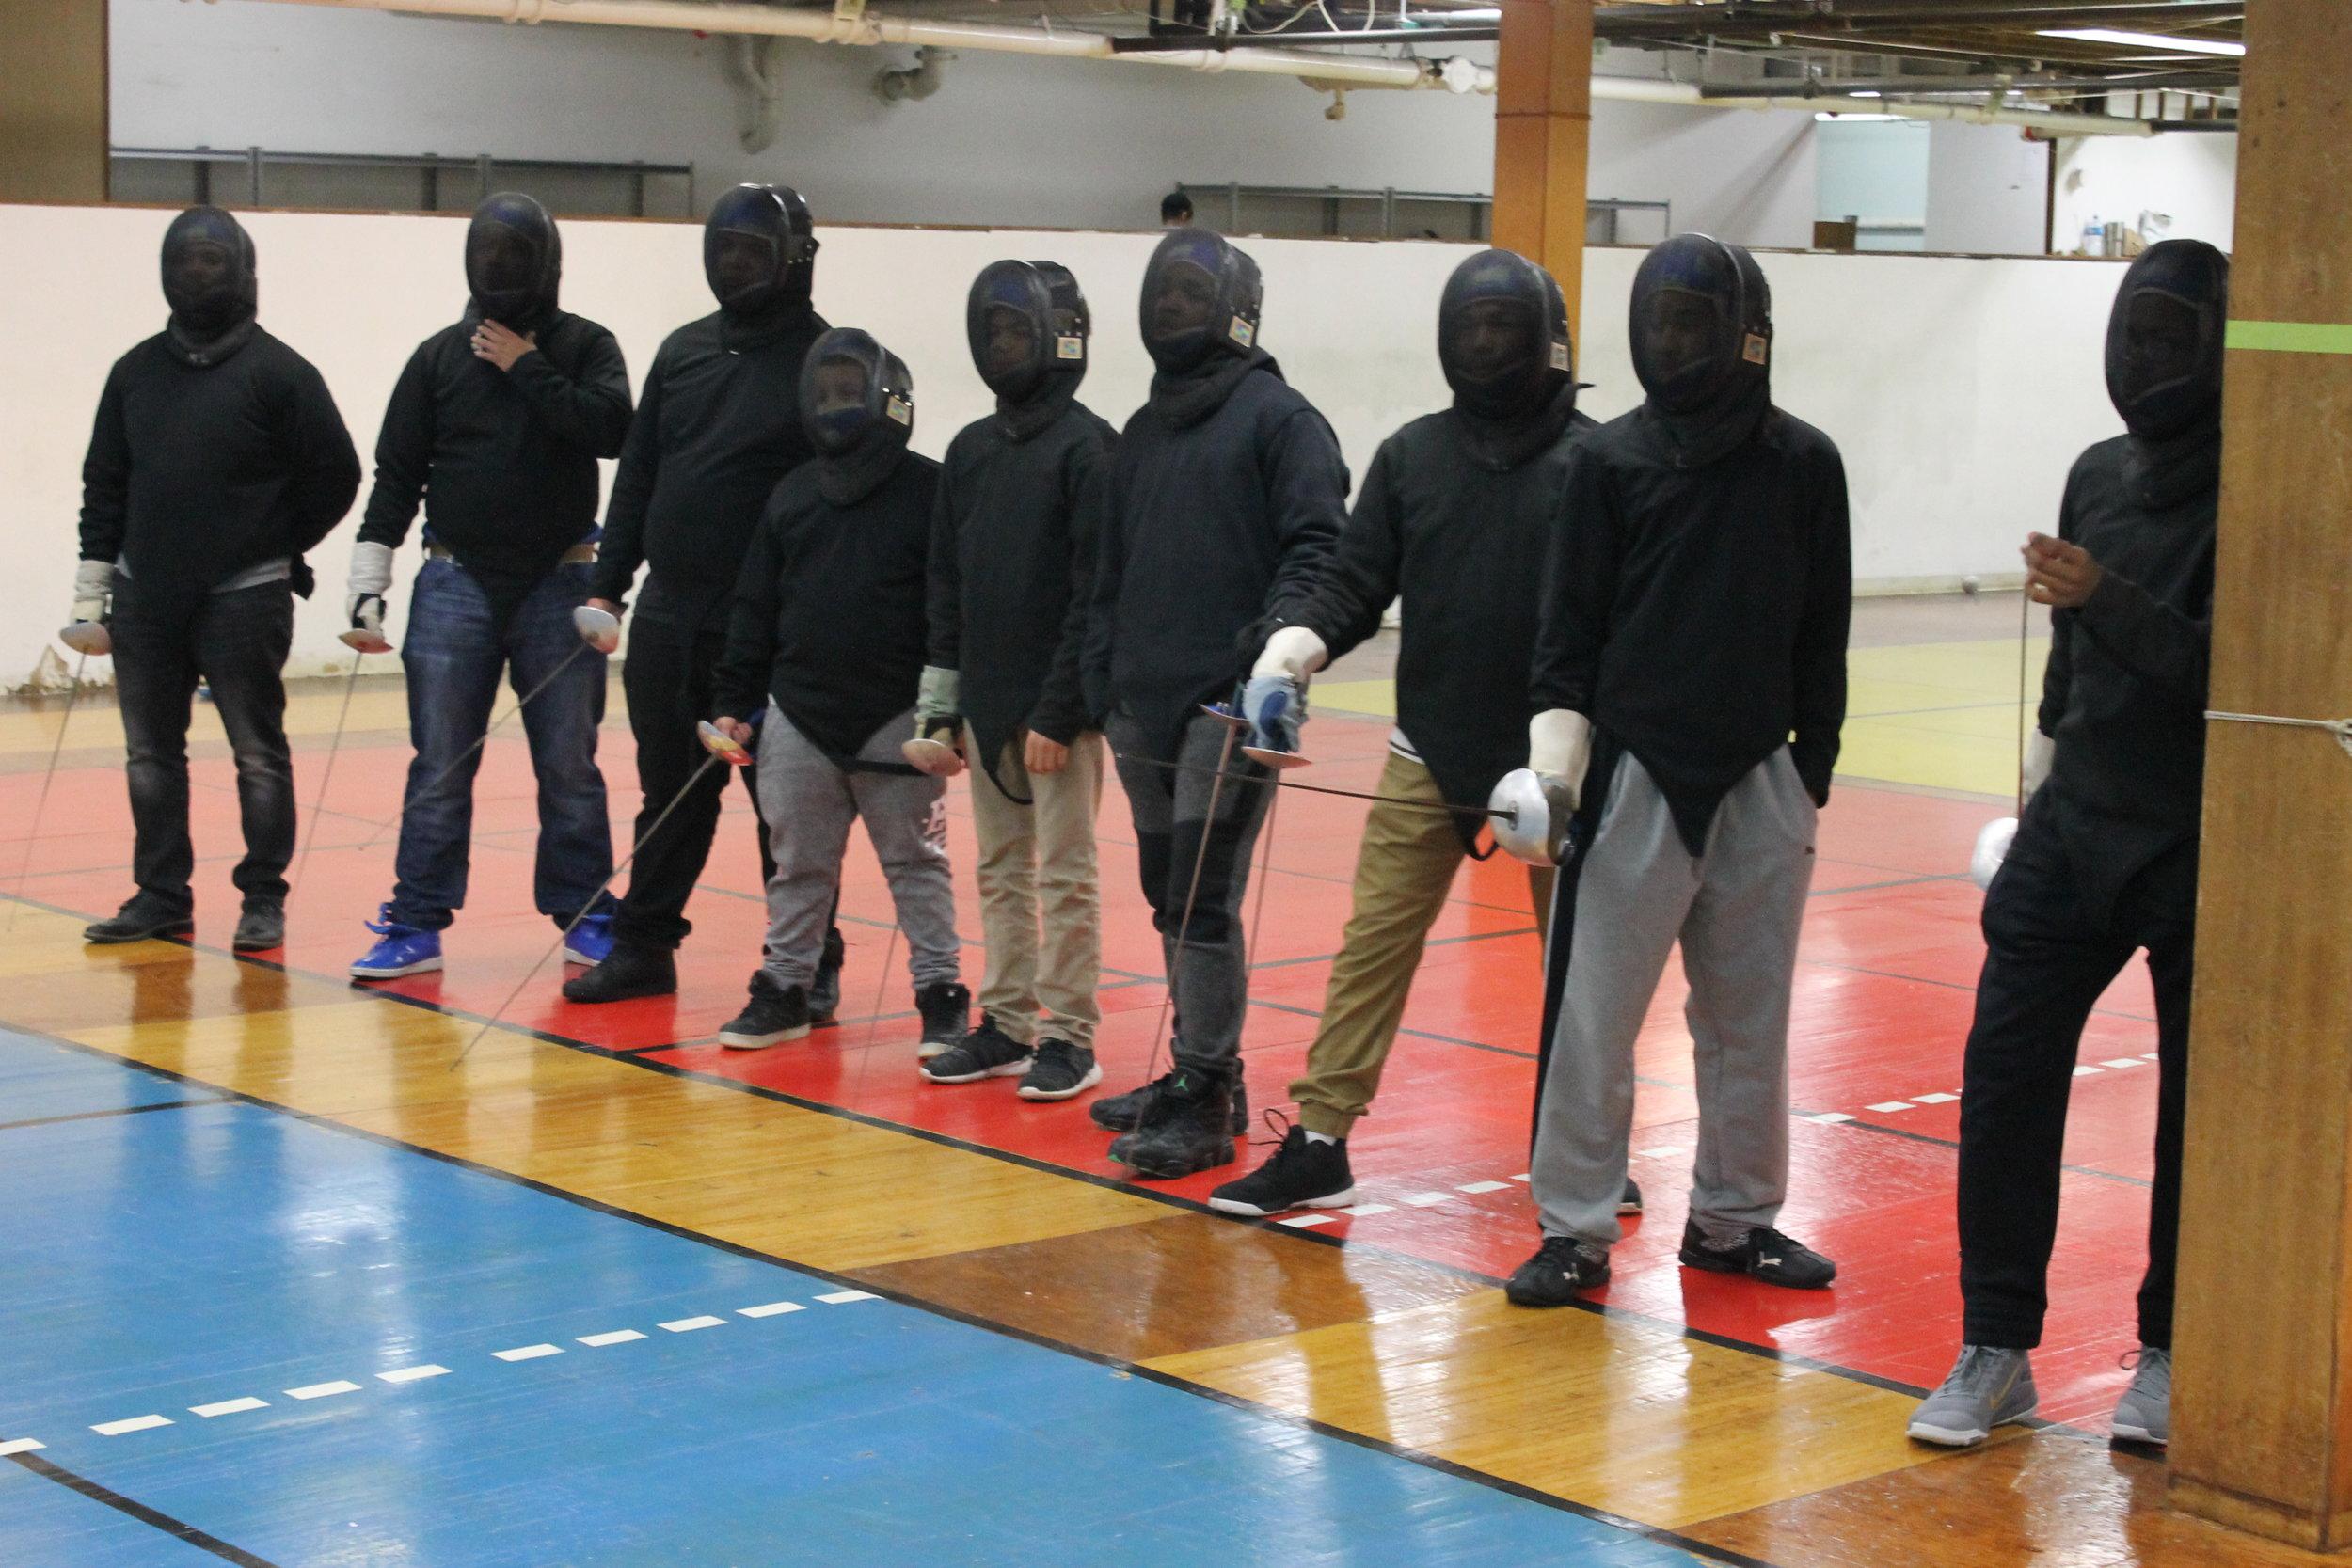 New Lens Urban Mentoring Society with Minnesota Swords Club Fencing #NewLensSociety 08.JPG